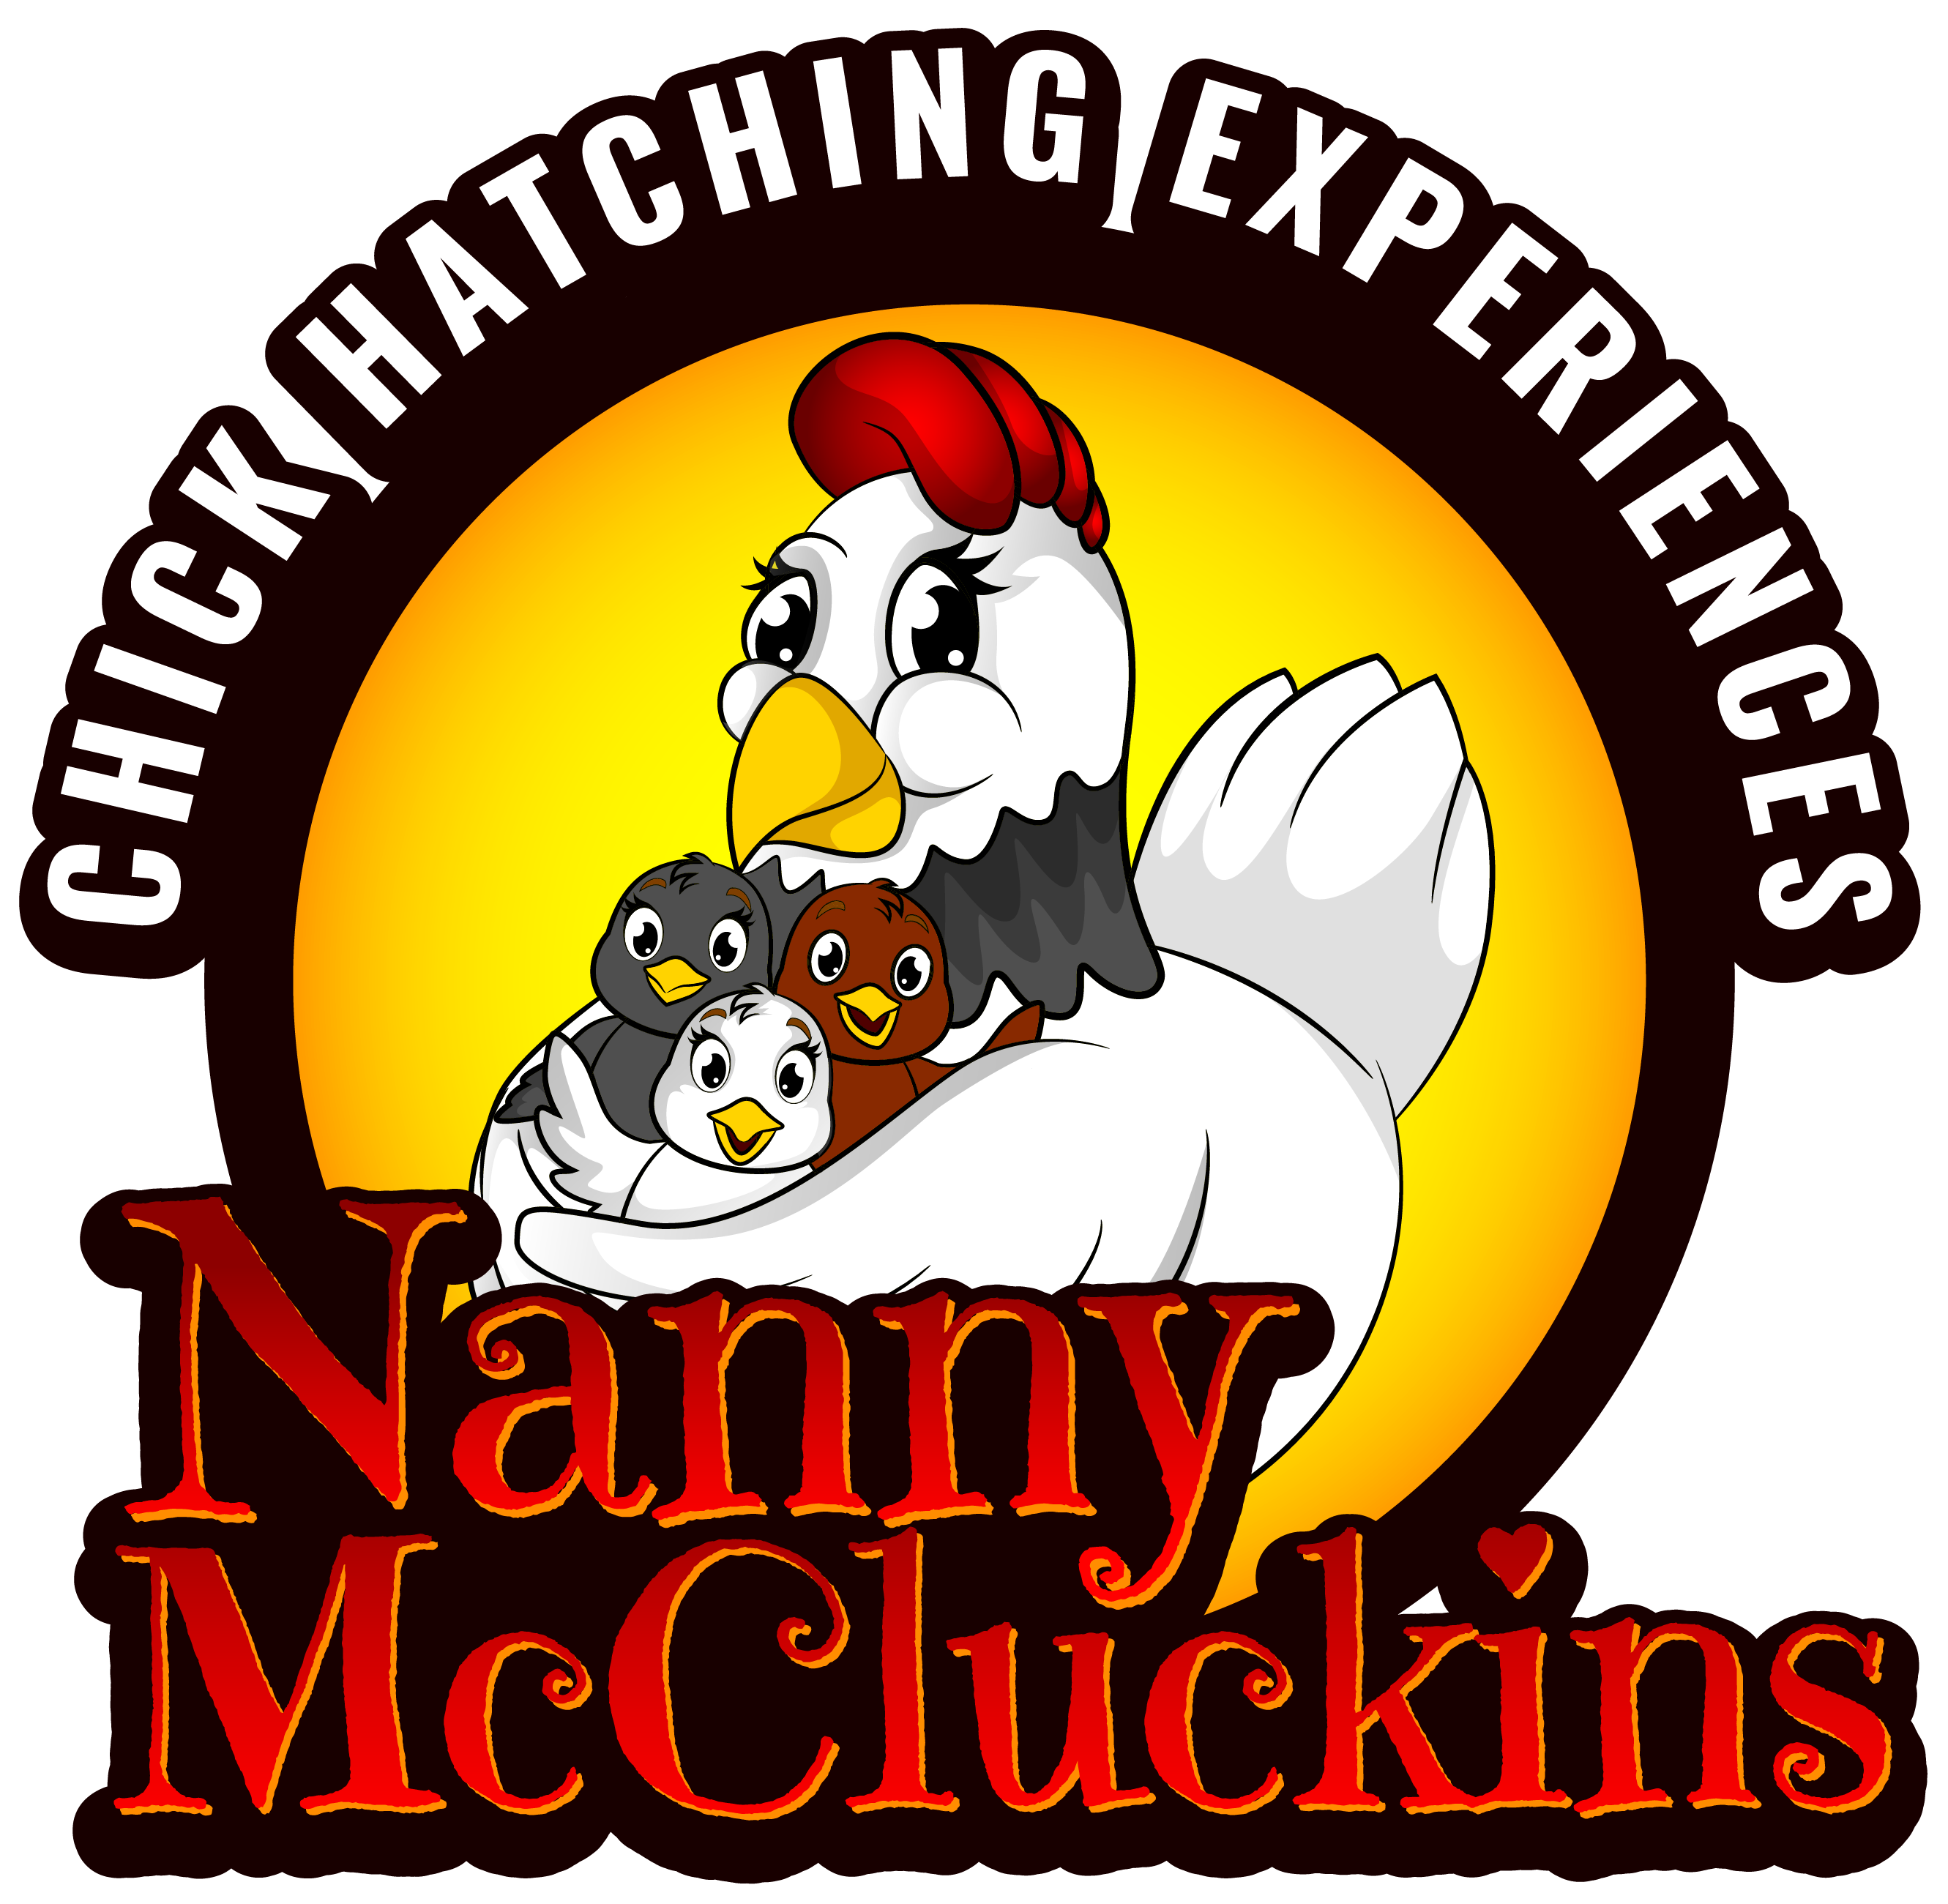 Nanny McCluckins